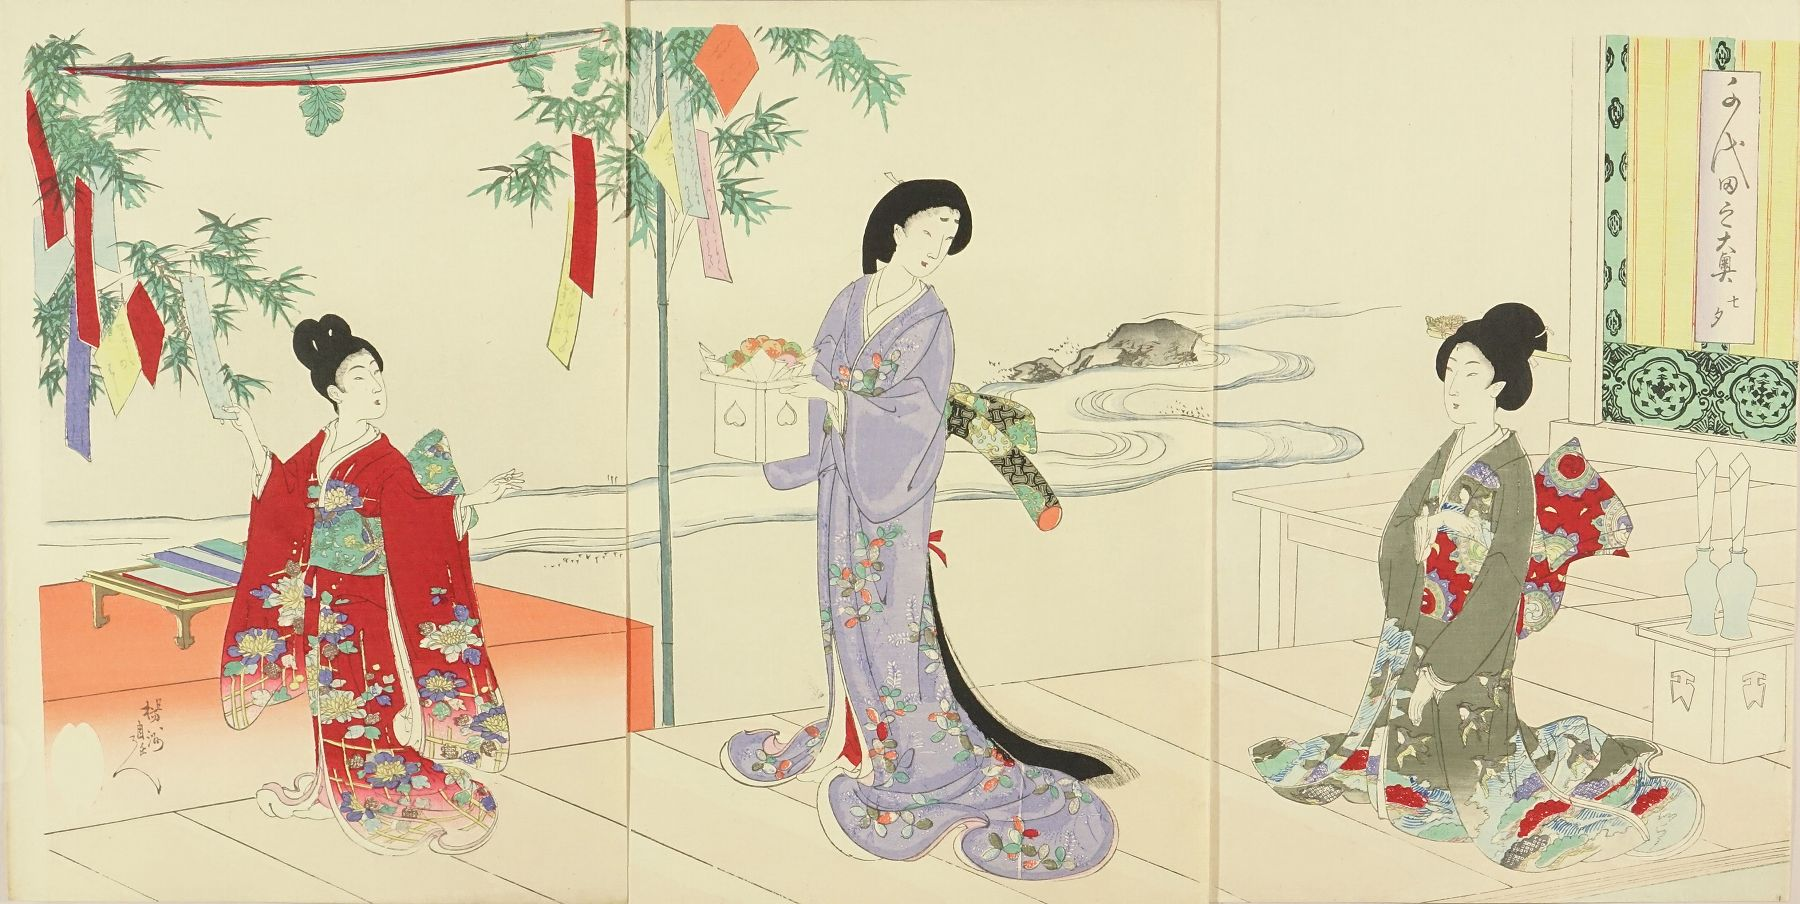 CHIKANOBU Tanabata Festival, from <i>Chiyoda no o-oku</i> (Inner palace of Edo Castle), triptych